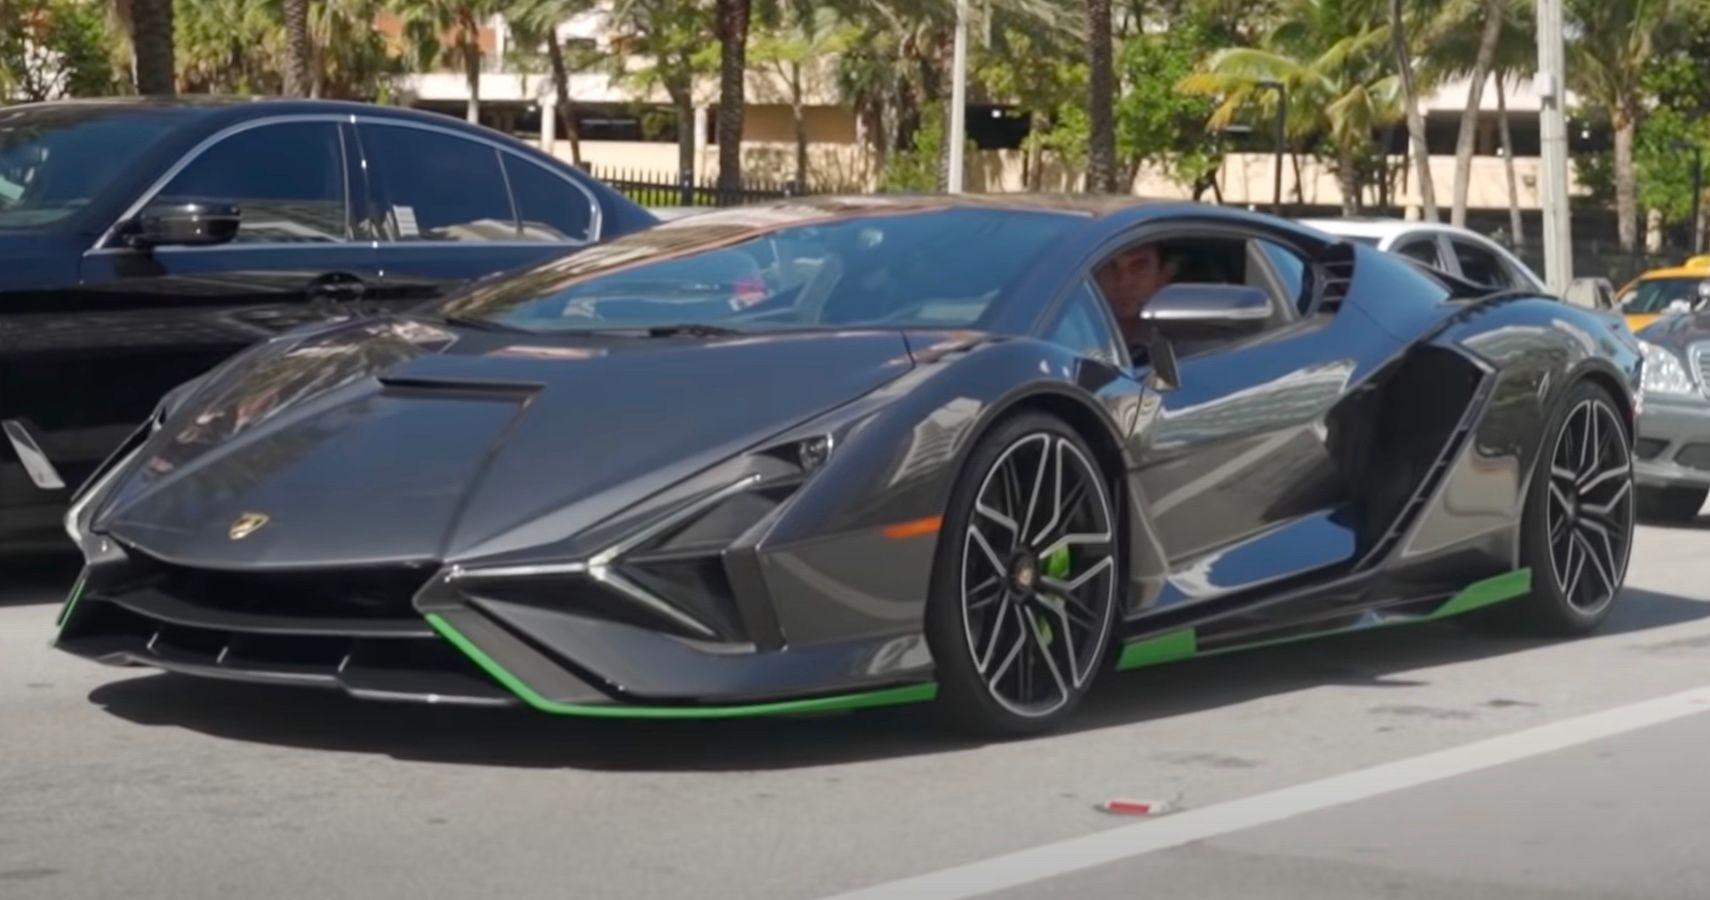 Lamborghini Sian Caught Revving Its Glorious V12 In Rare Sighting On Miami's Streets